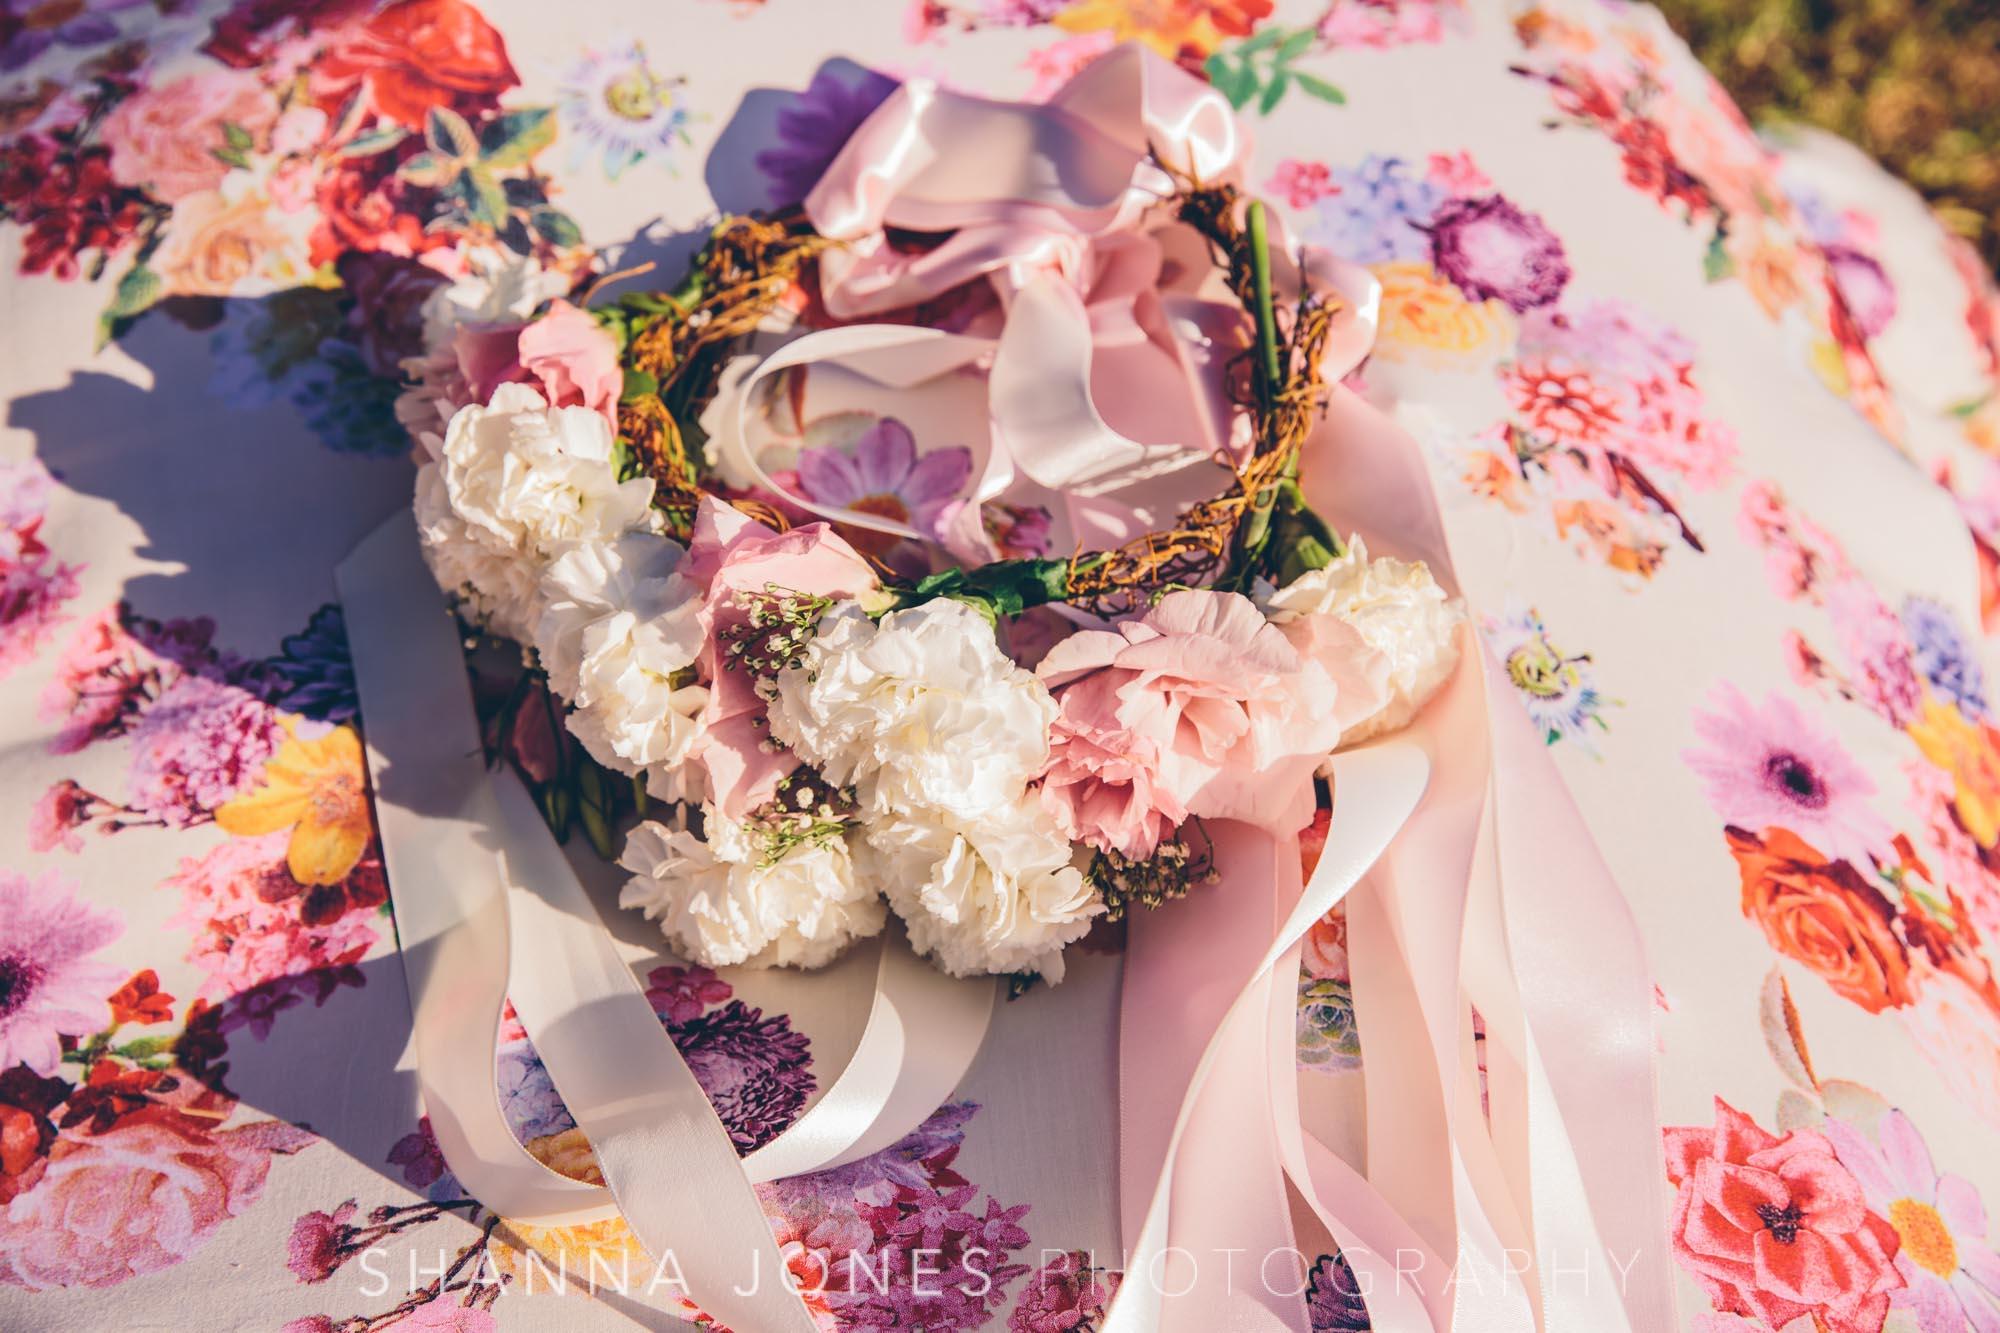 hawksmoor-house-cape-town-wedding-shanna-jones-photography-vanessa-cyril-44.jpg